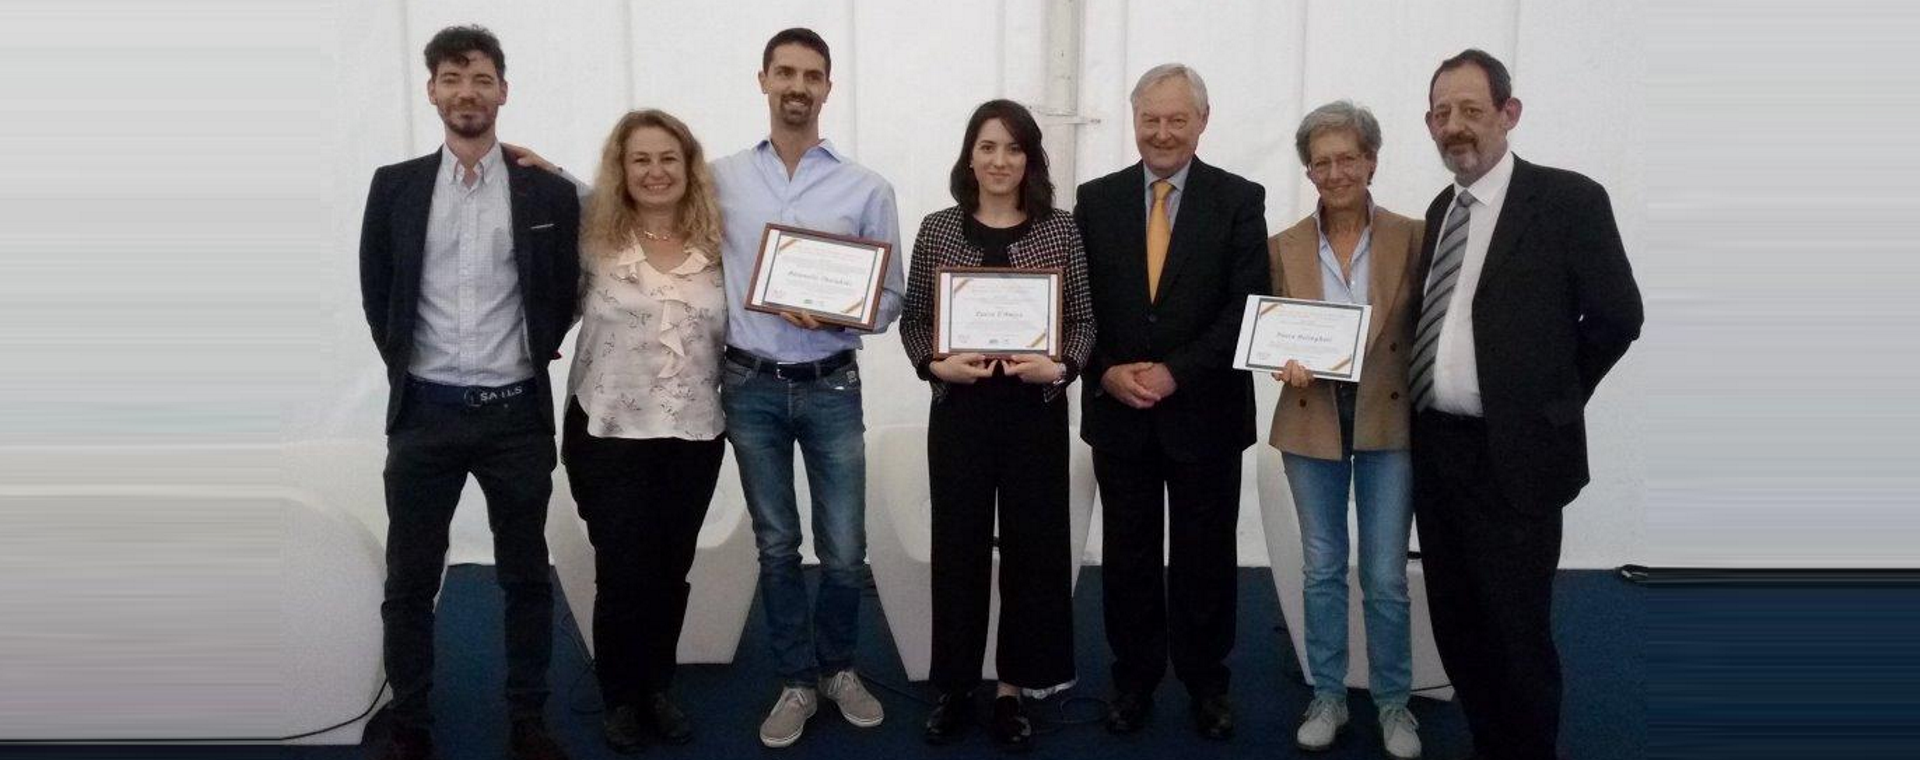 Consegna dei Premi Bernardo Nobile 2018